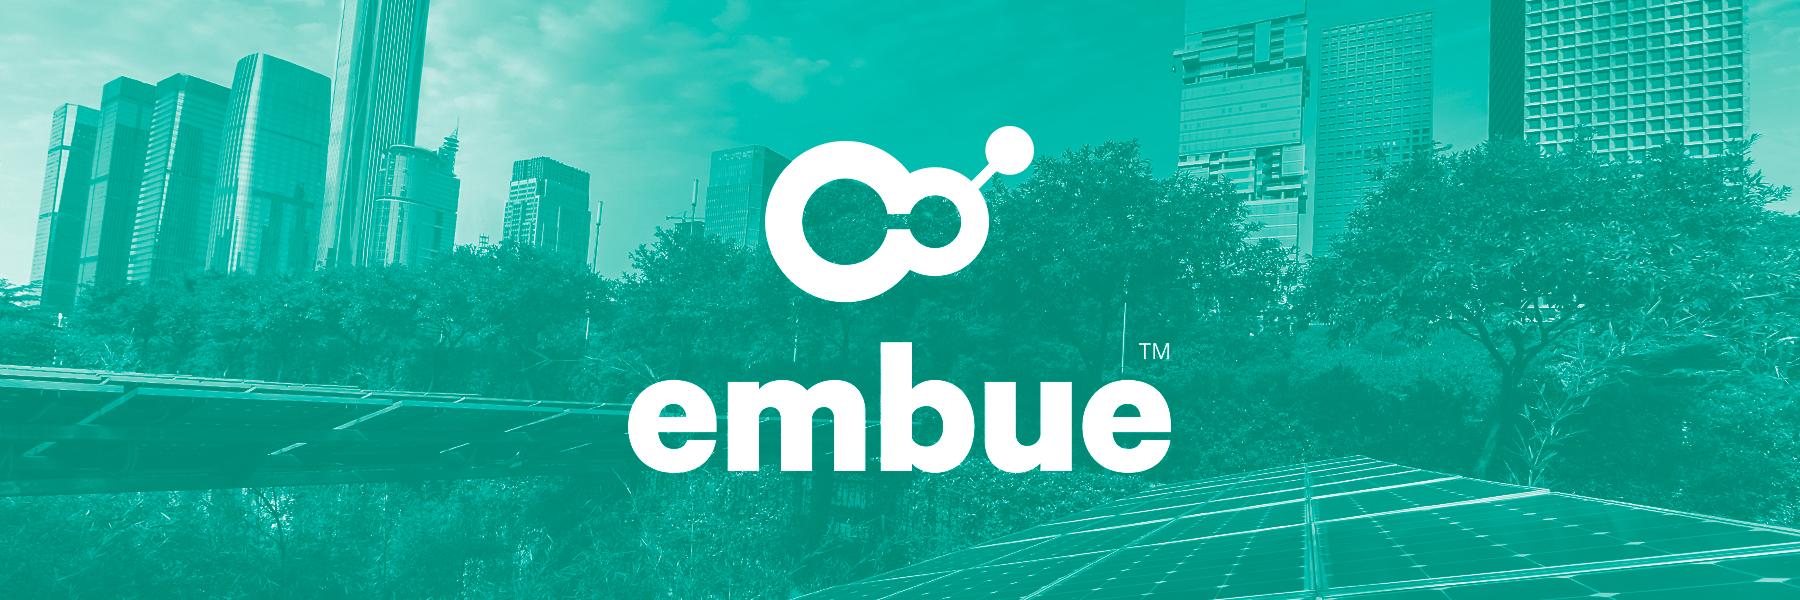 Embue, Apartment Building Intelligence